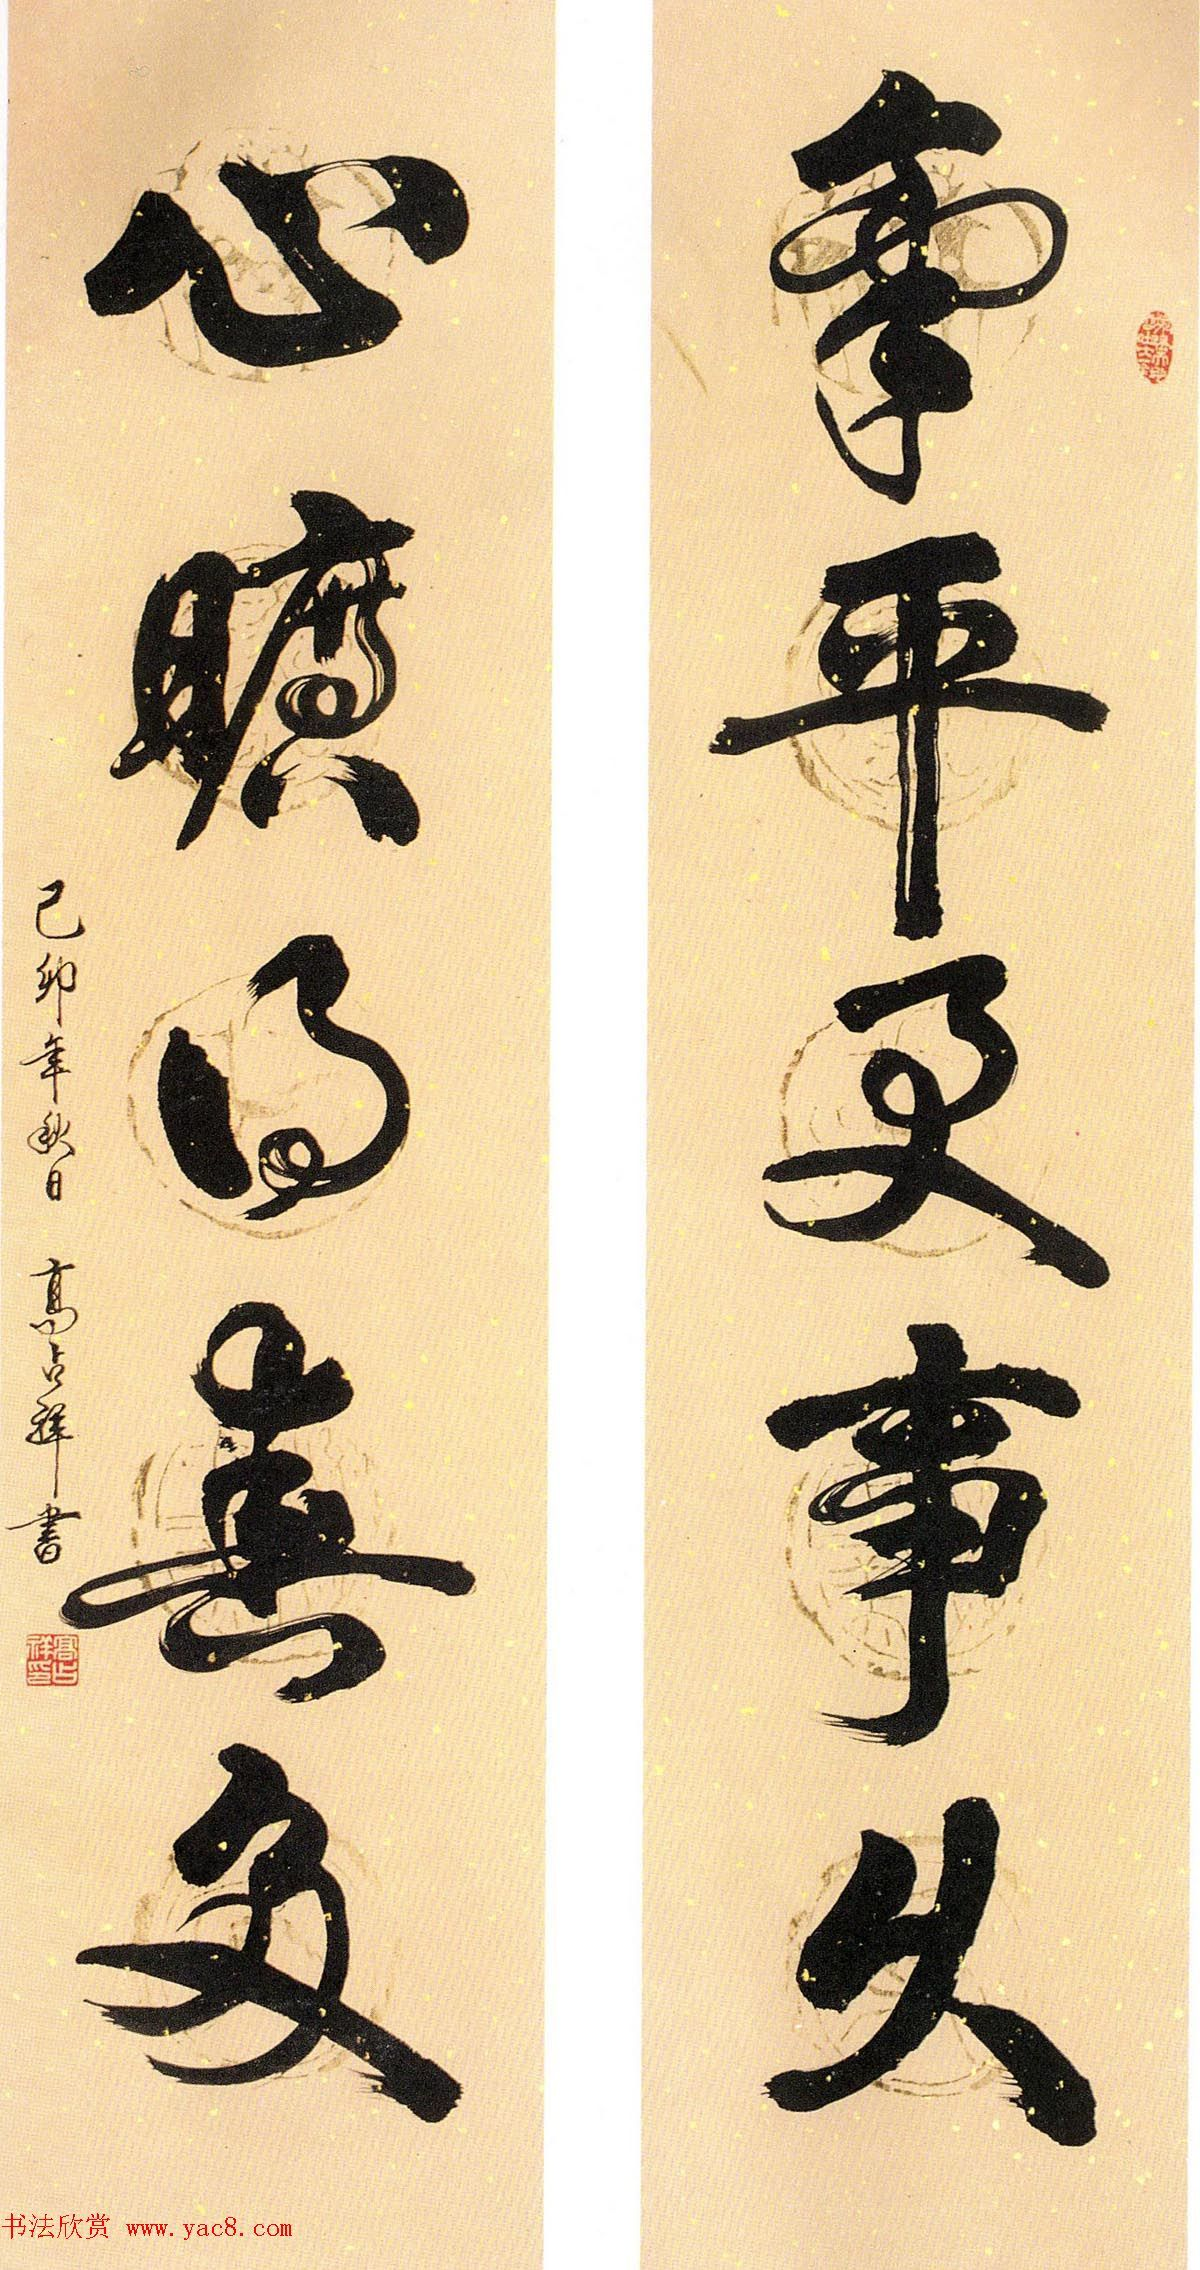 全国第三届楹联书法大展特邀作品欣赏 Japanese calligraphy, Mark making